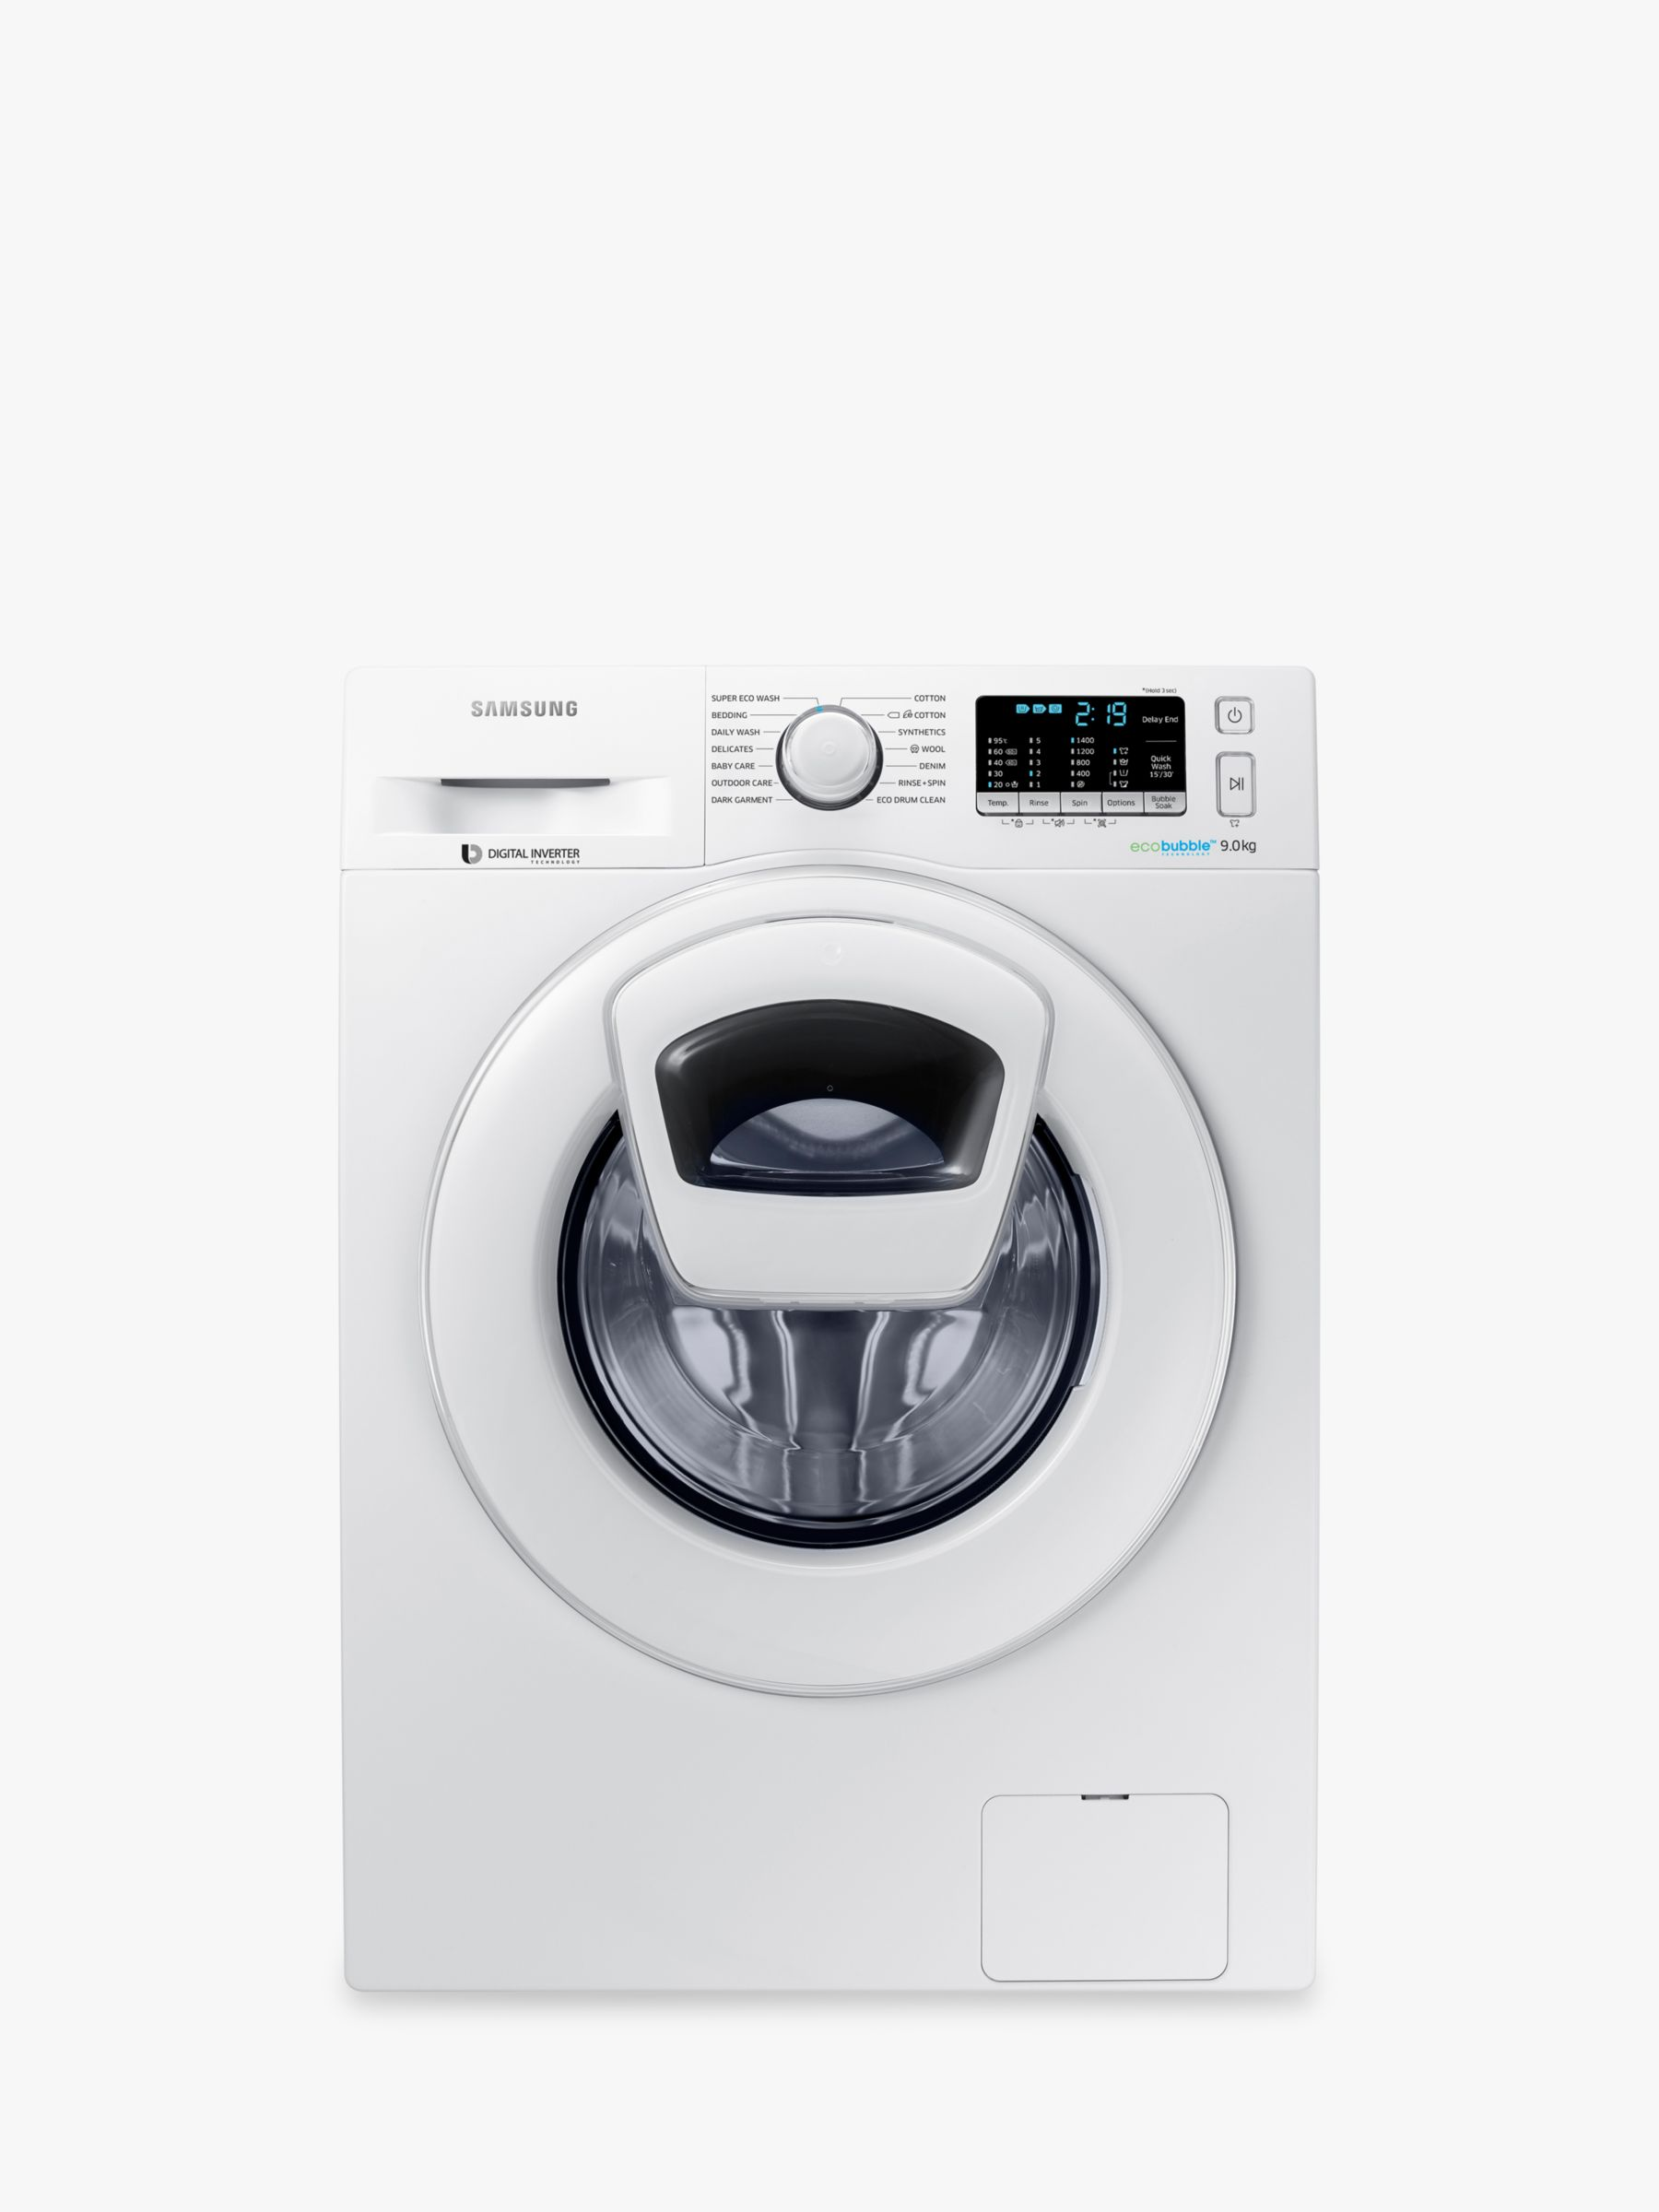 Samsung Samsung AddWash WW90K5410WW/EU Washing Machine, 9kg Load, A+++ Energy Rating, 1400rpm Spin, White